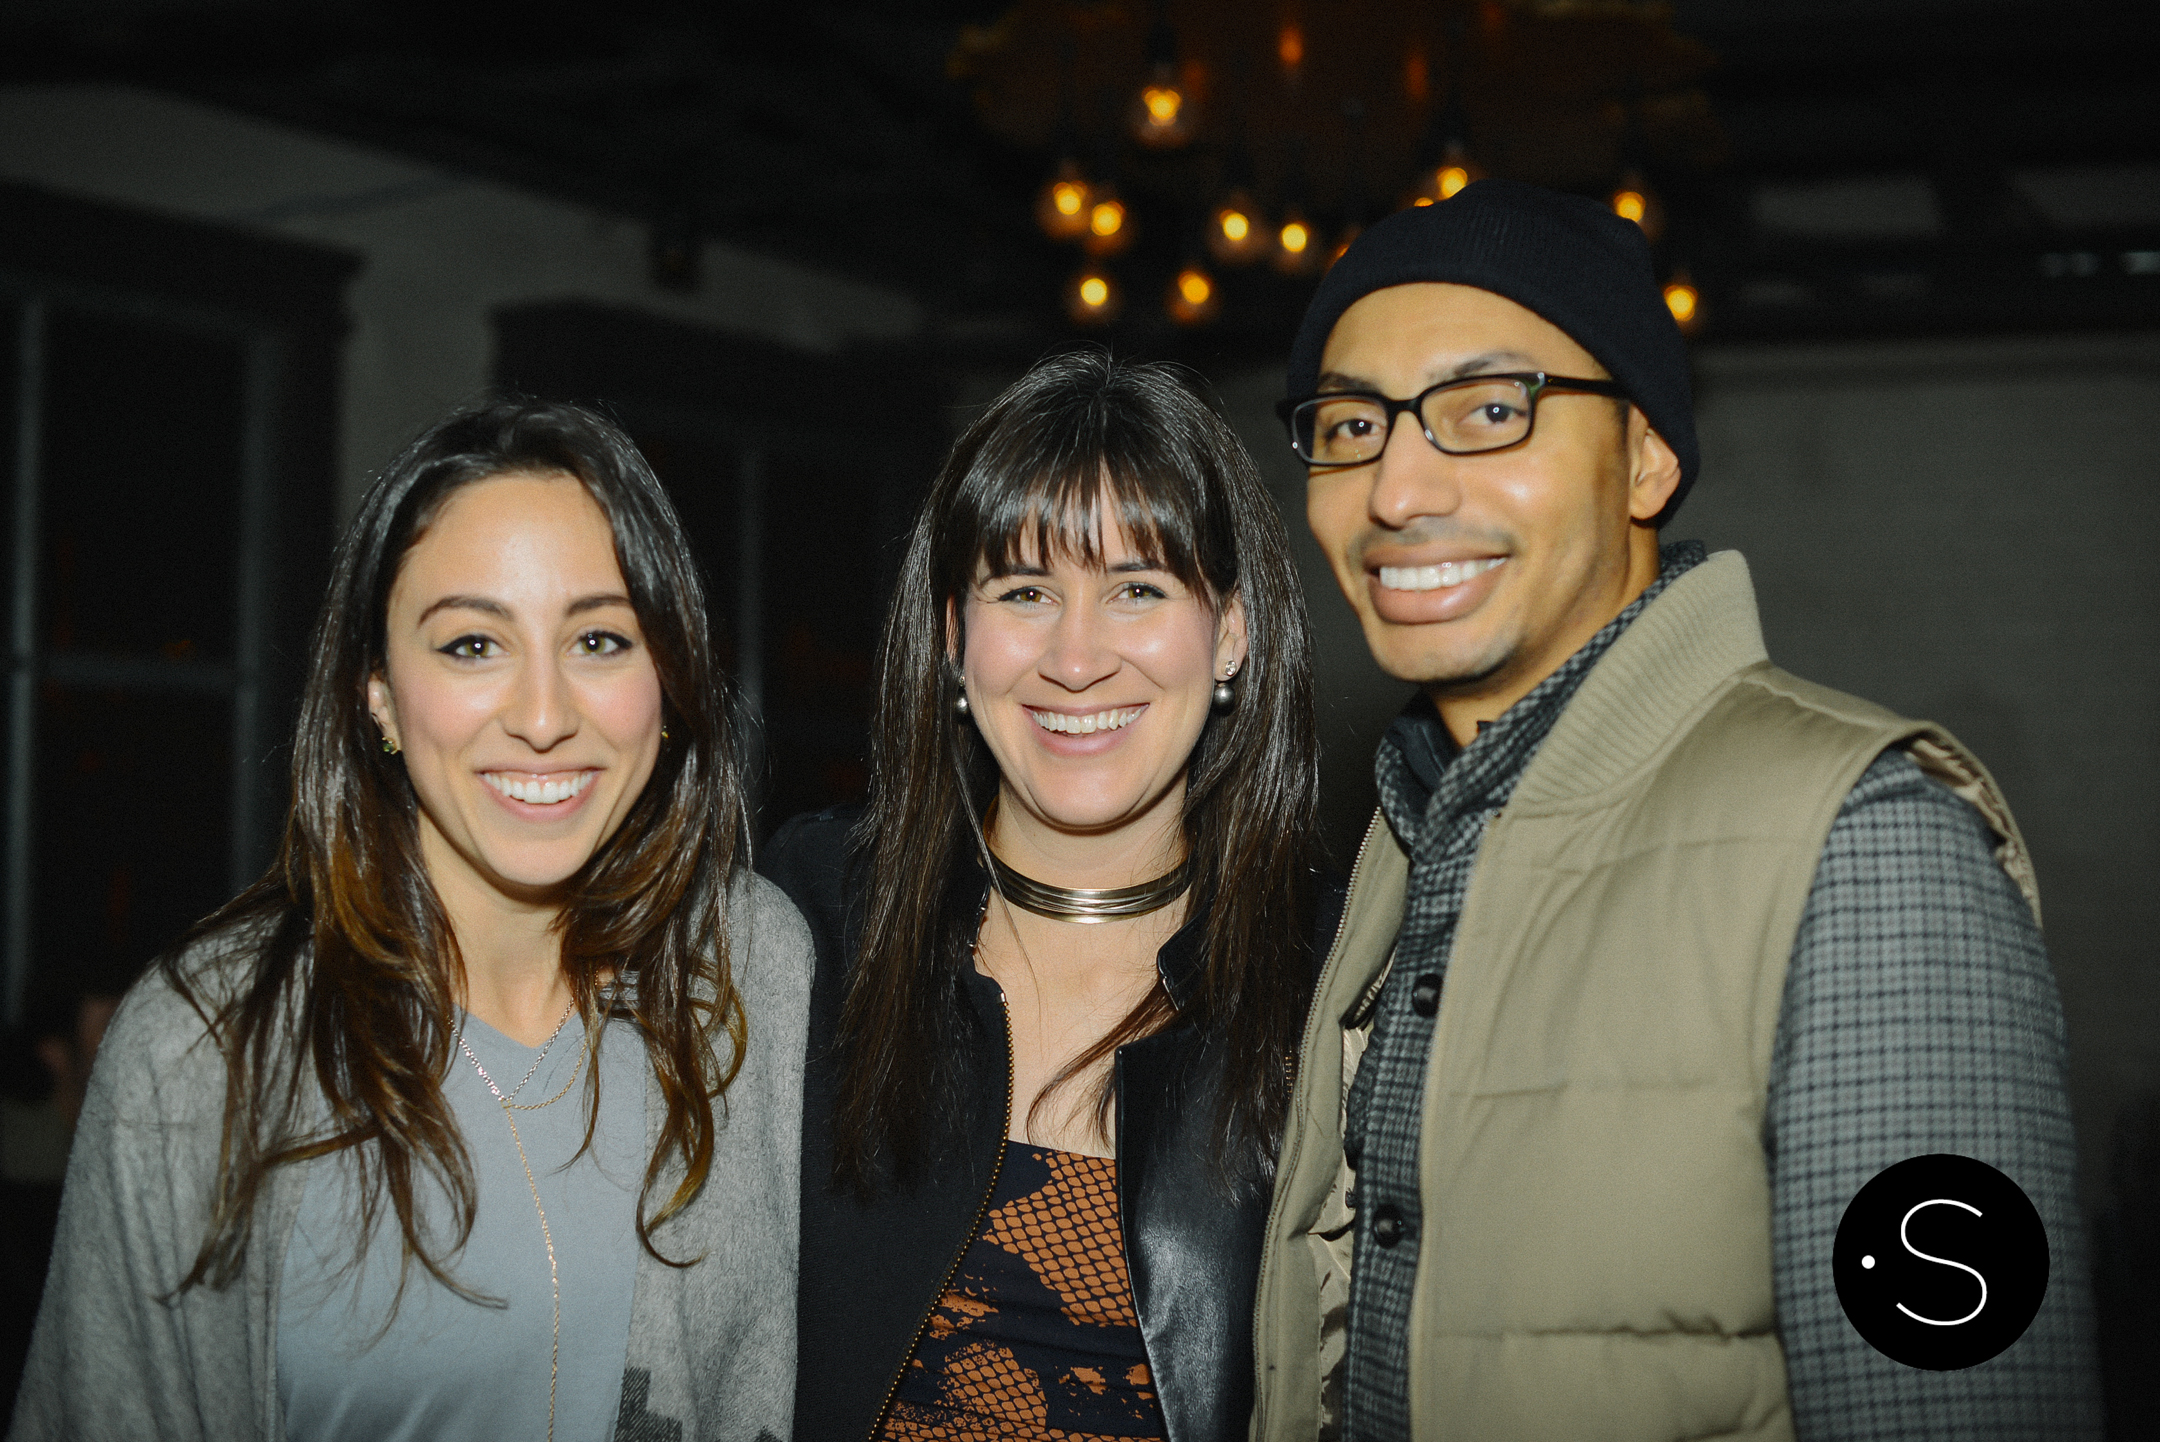 Rachelle Palasota, Mclaine Richardson and Robert Campbell